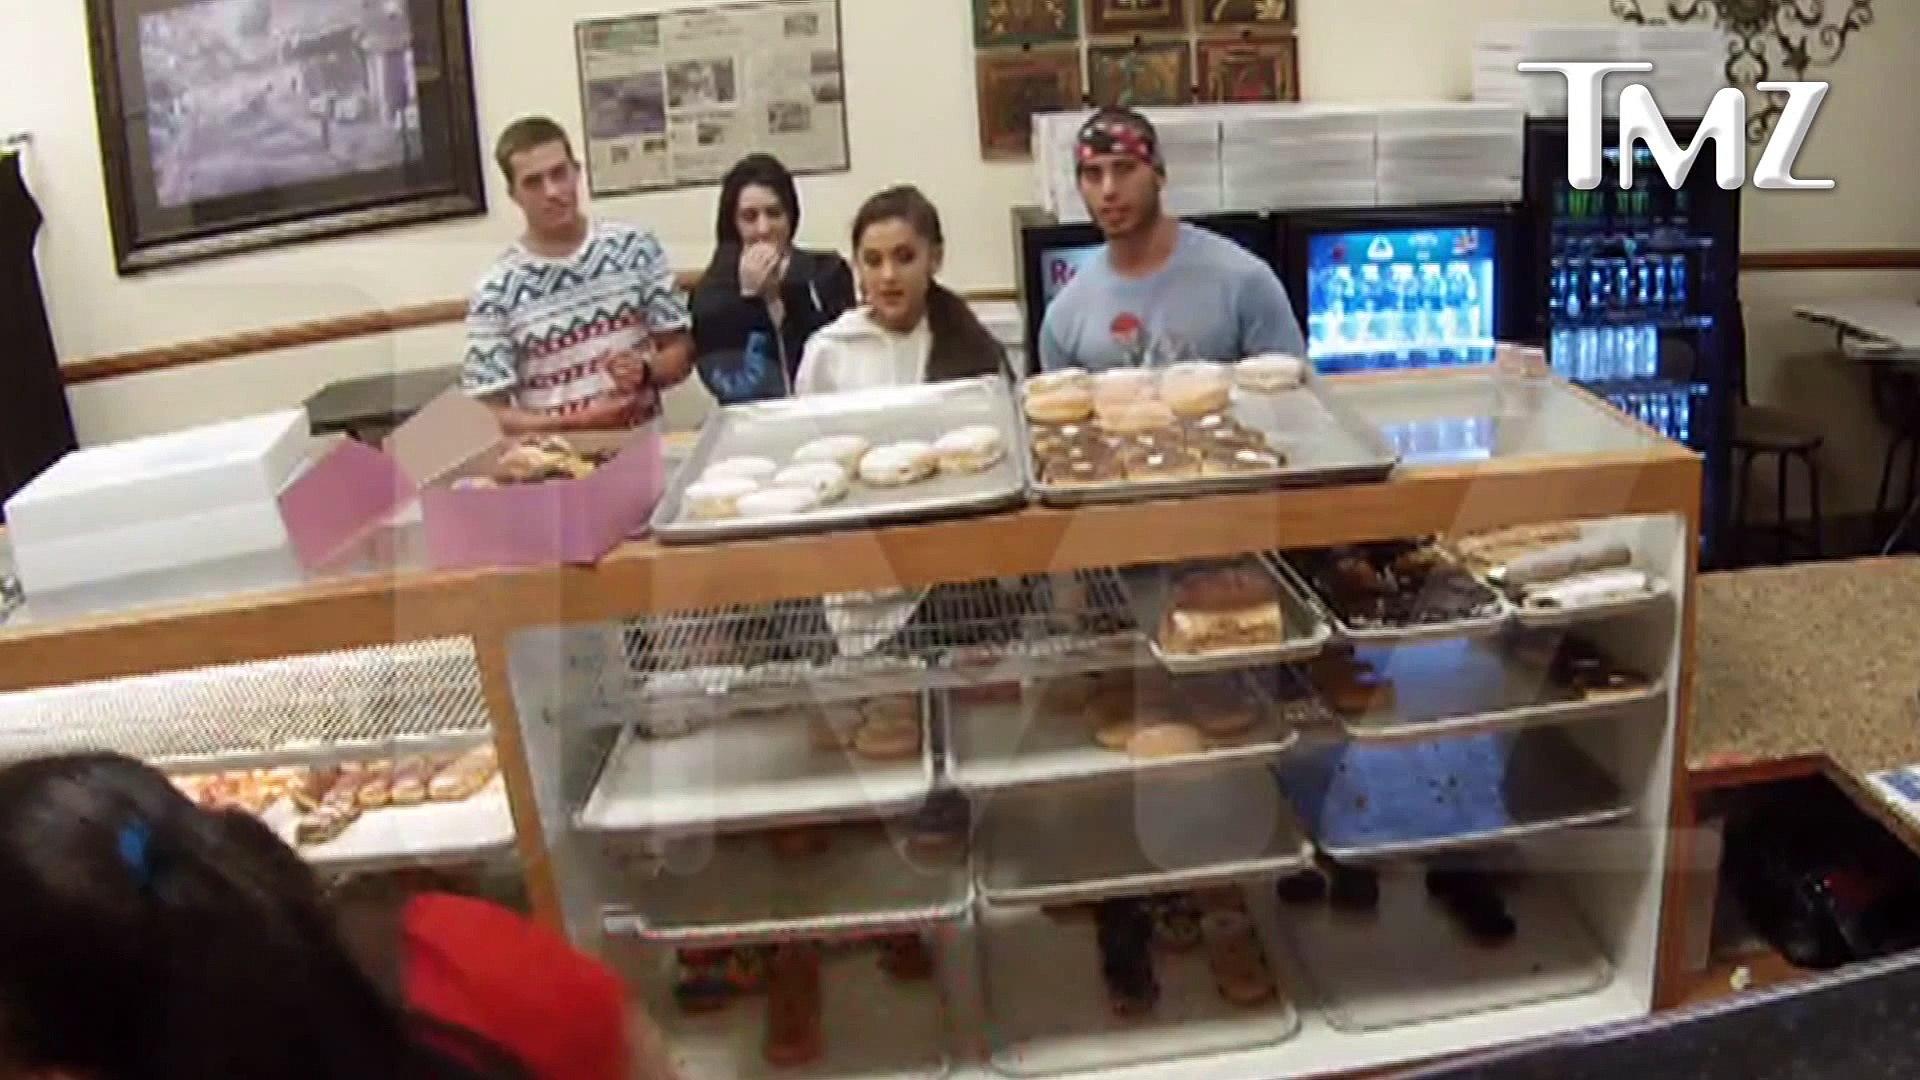 Ariana Grande Tongues New Boyfriend & Donuts!!